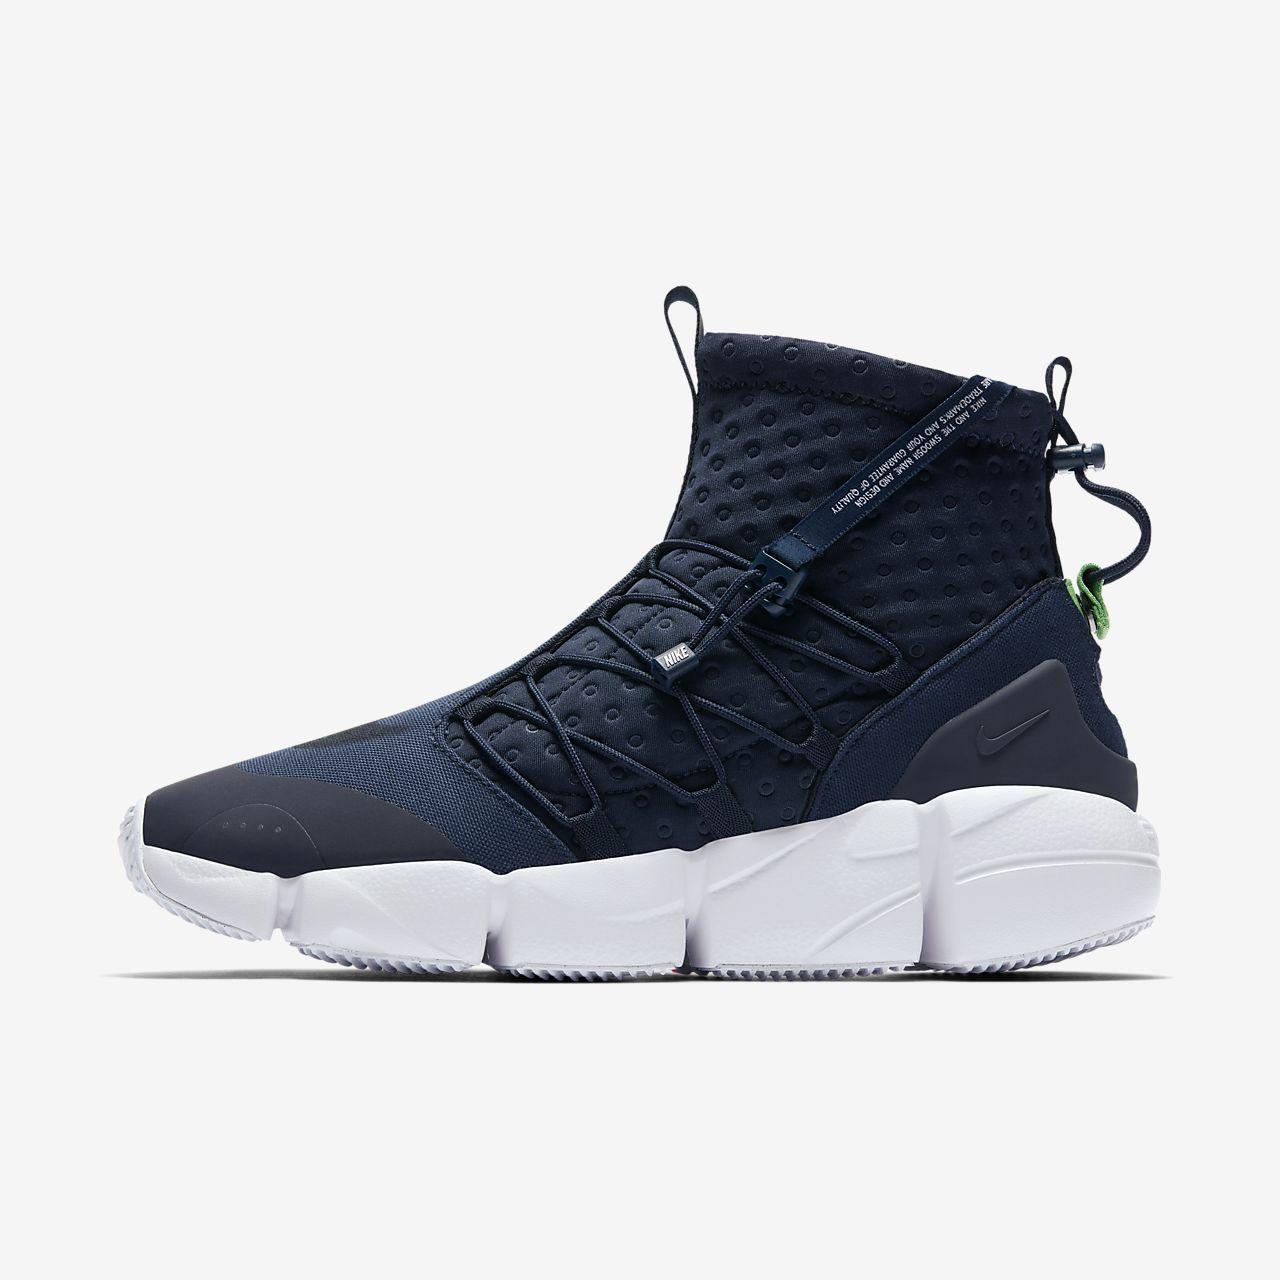 Nike Air Footscape Mid Utility 男子运动鞋